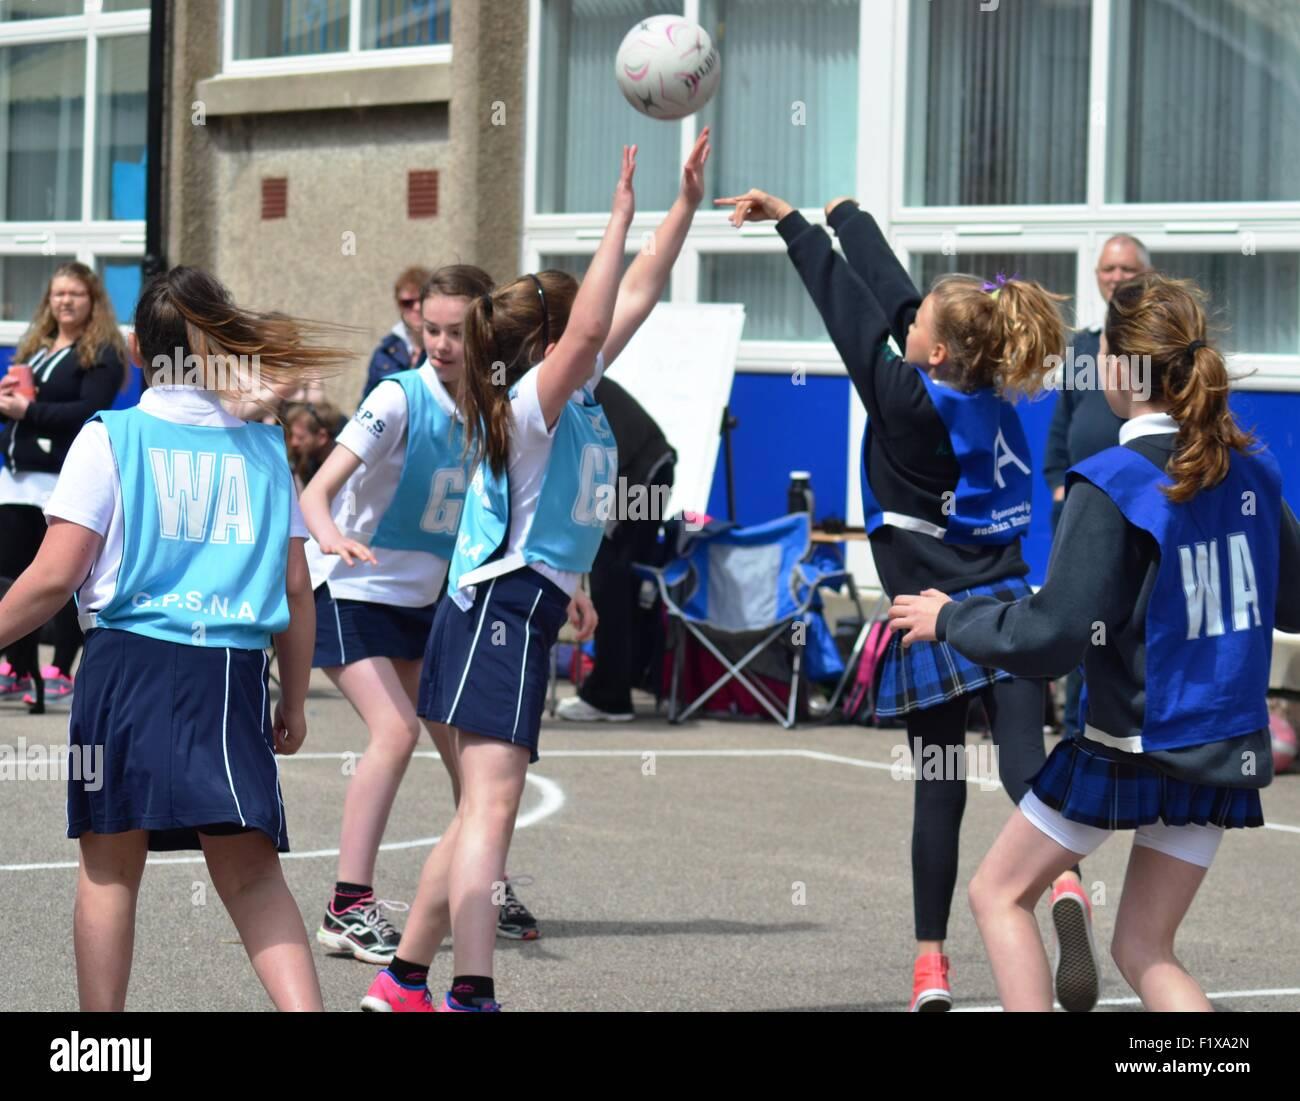 Niñas a jugar baloncesto fuera Imagen De Stock